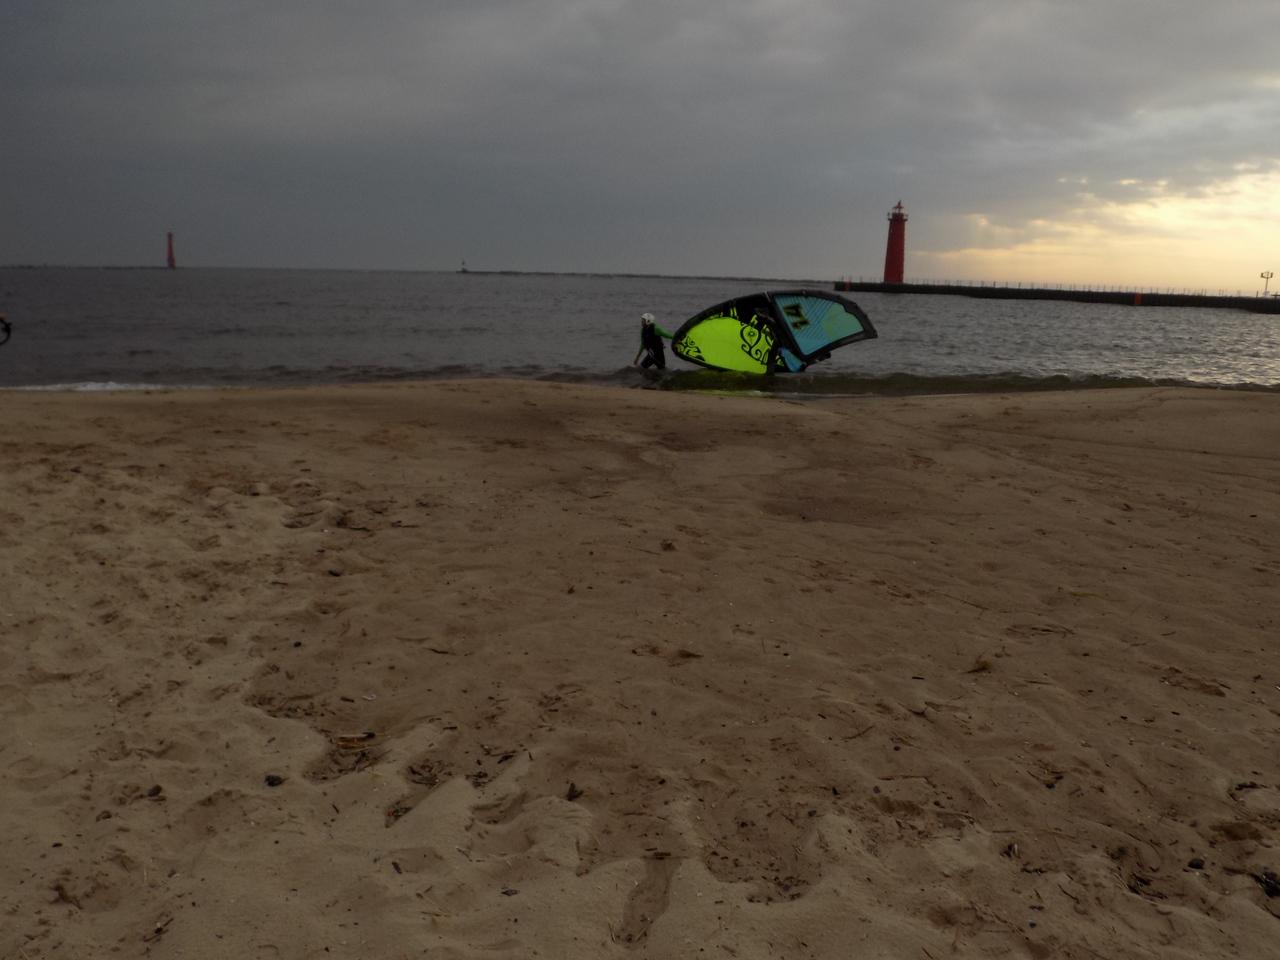 Windsurfing on Lake Michigan beach, near Muskegon, June 2015. Credit: NOAA